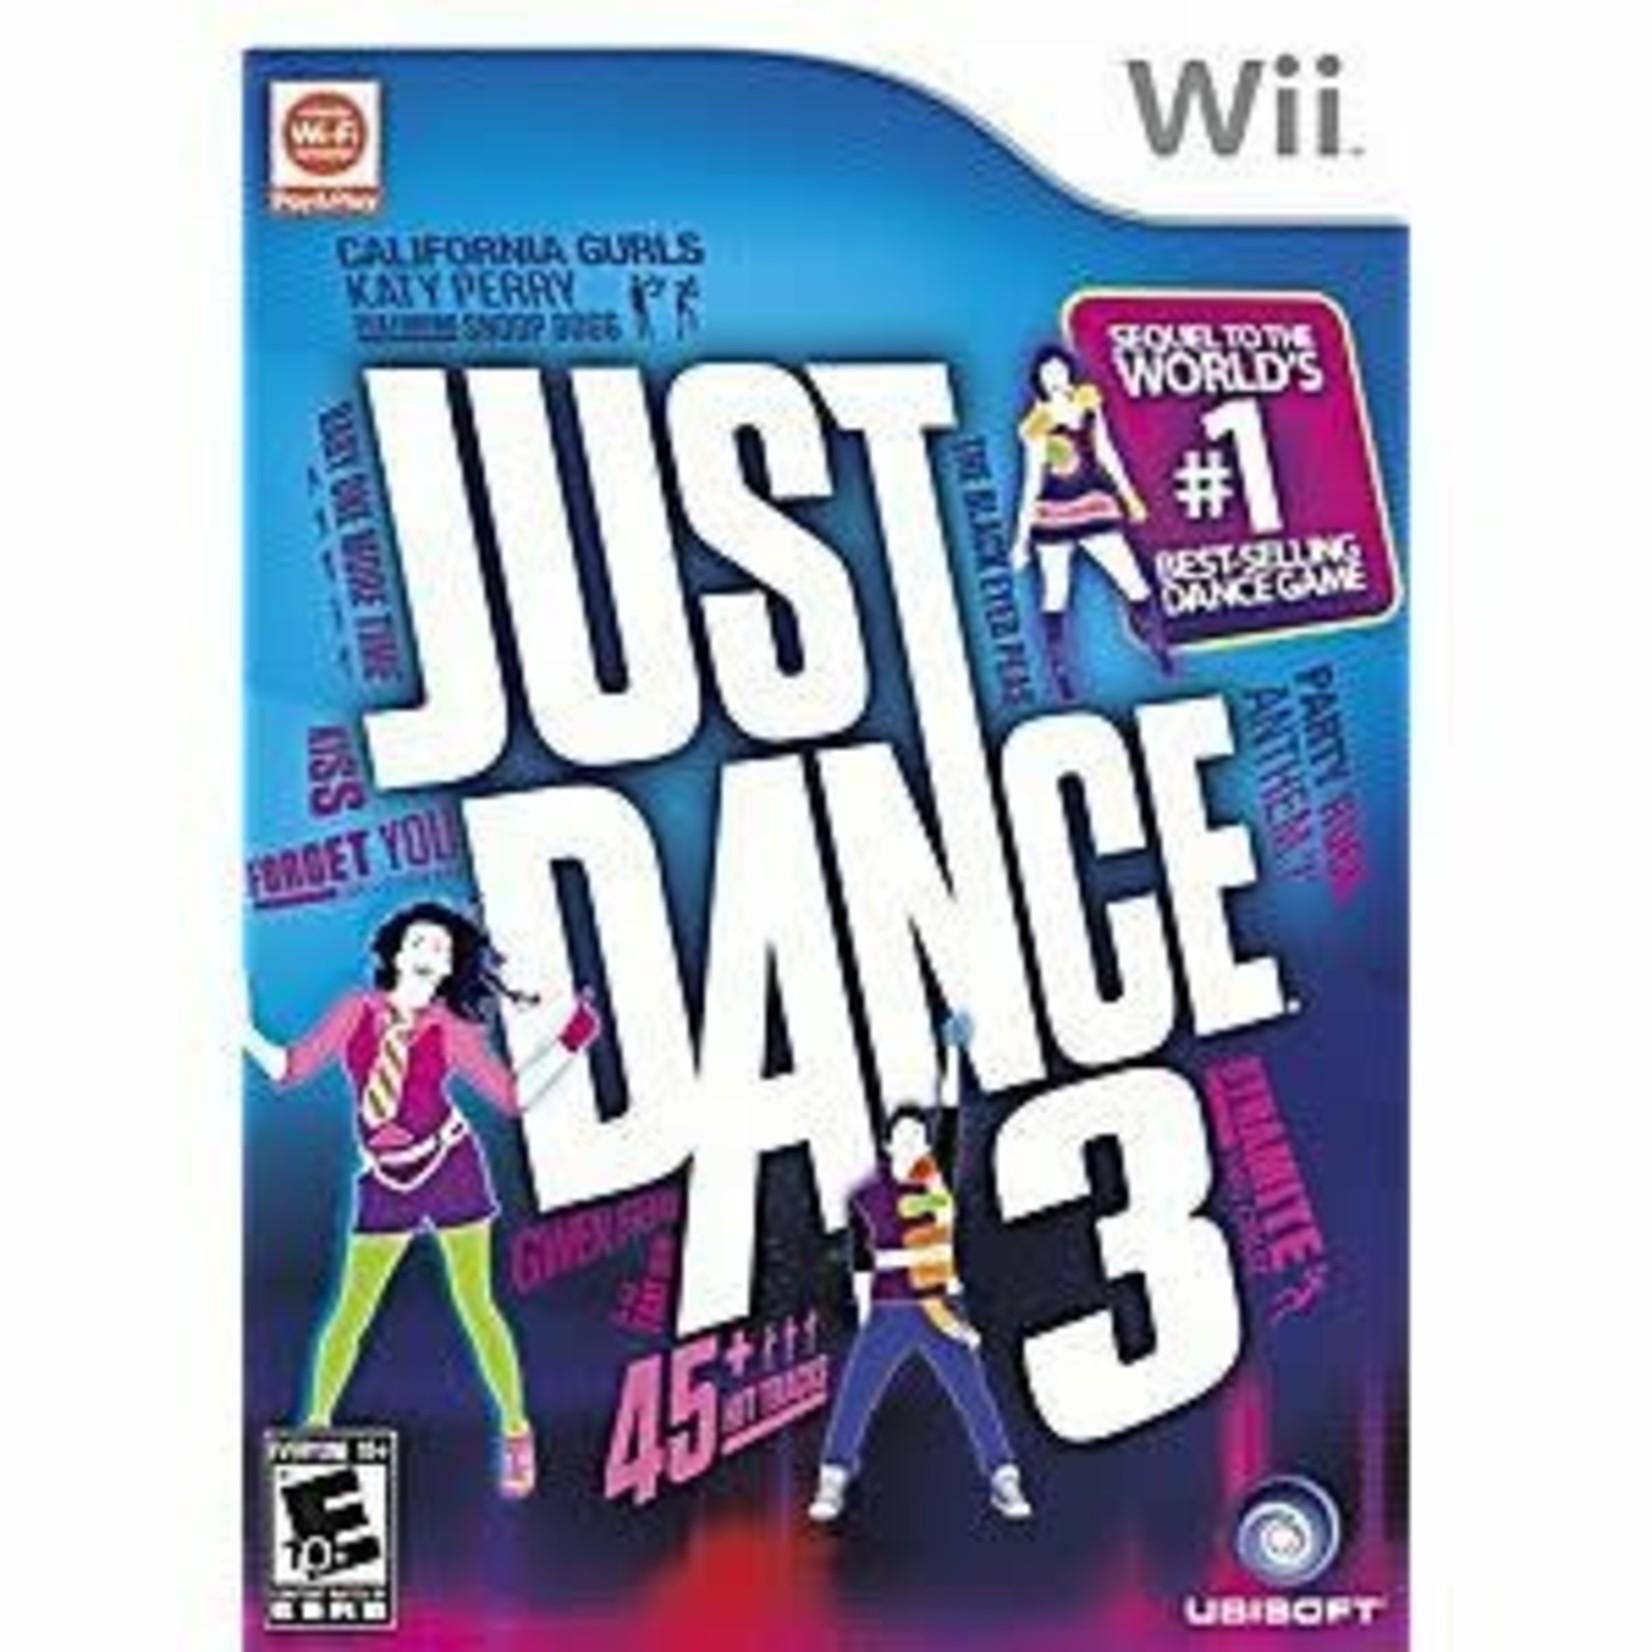 WIIUSD-JUST DANCE 3